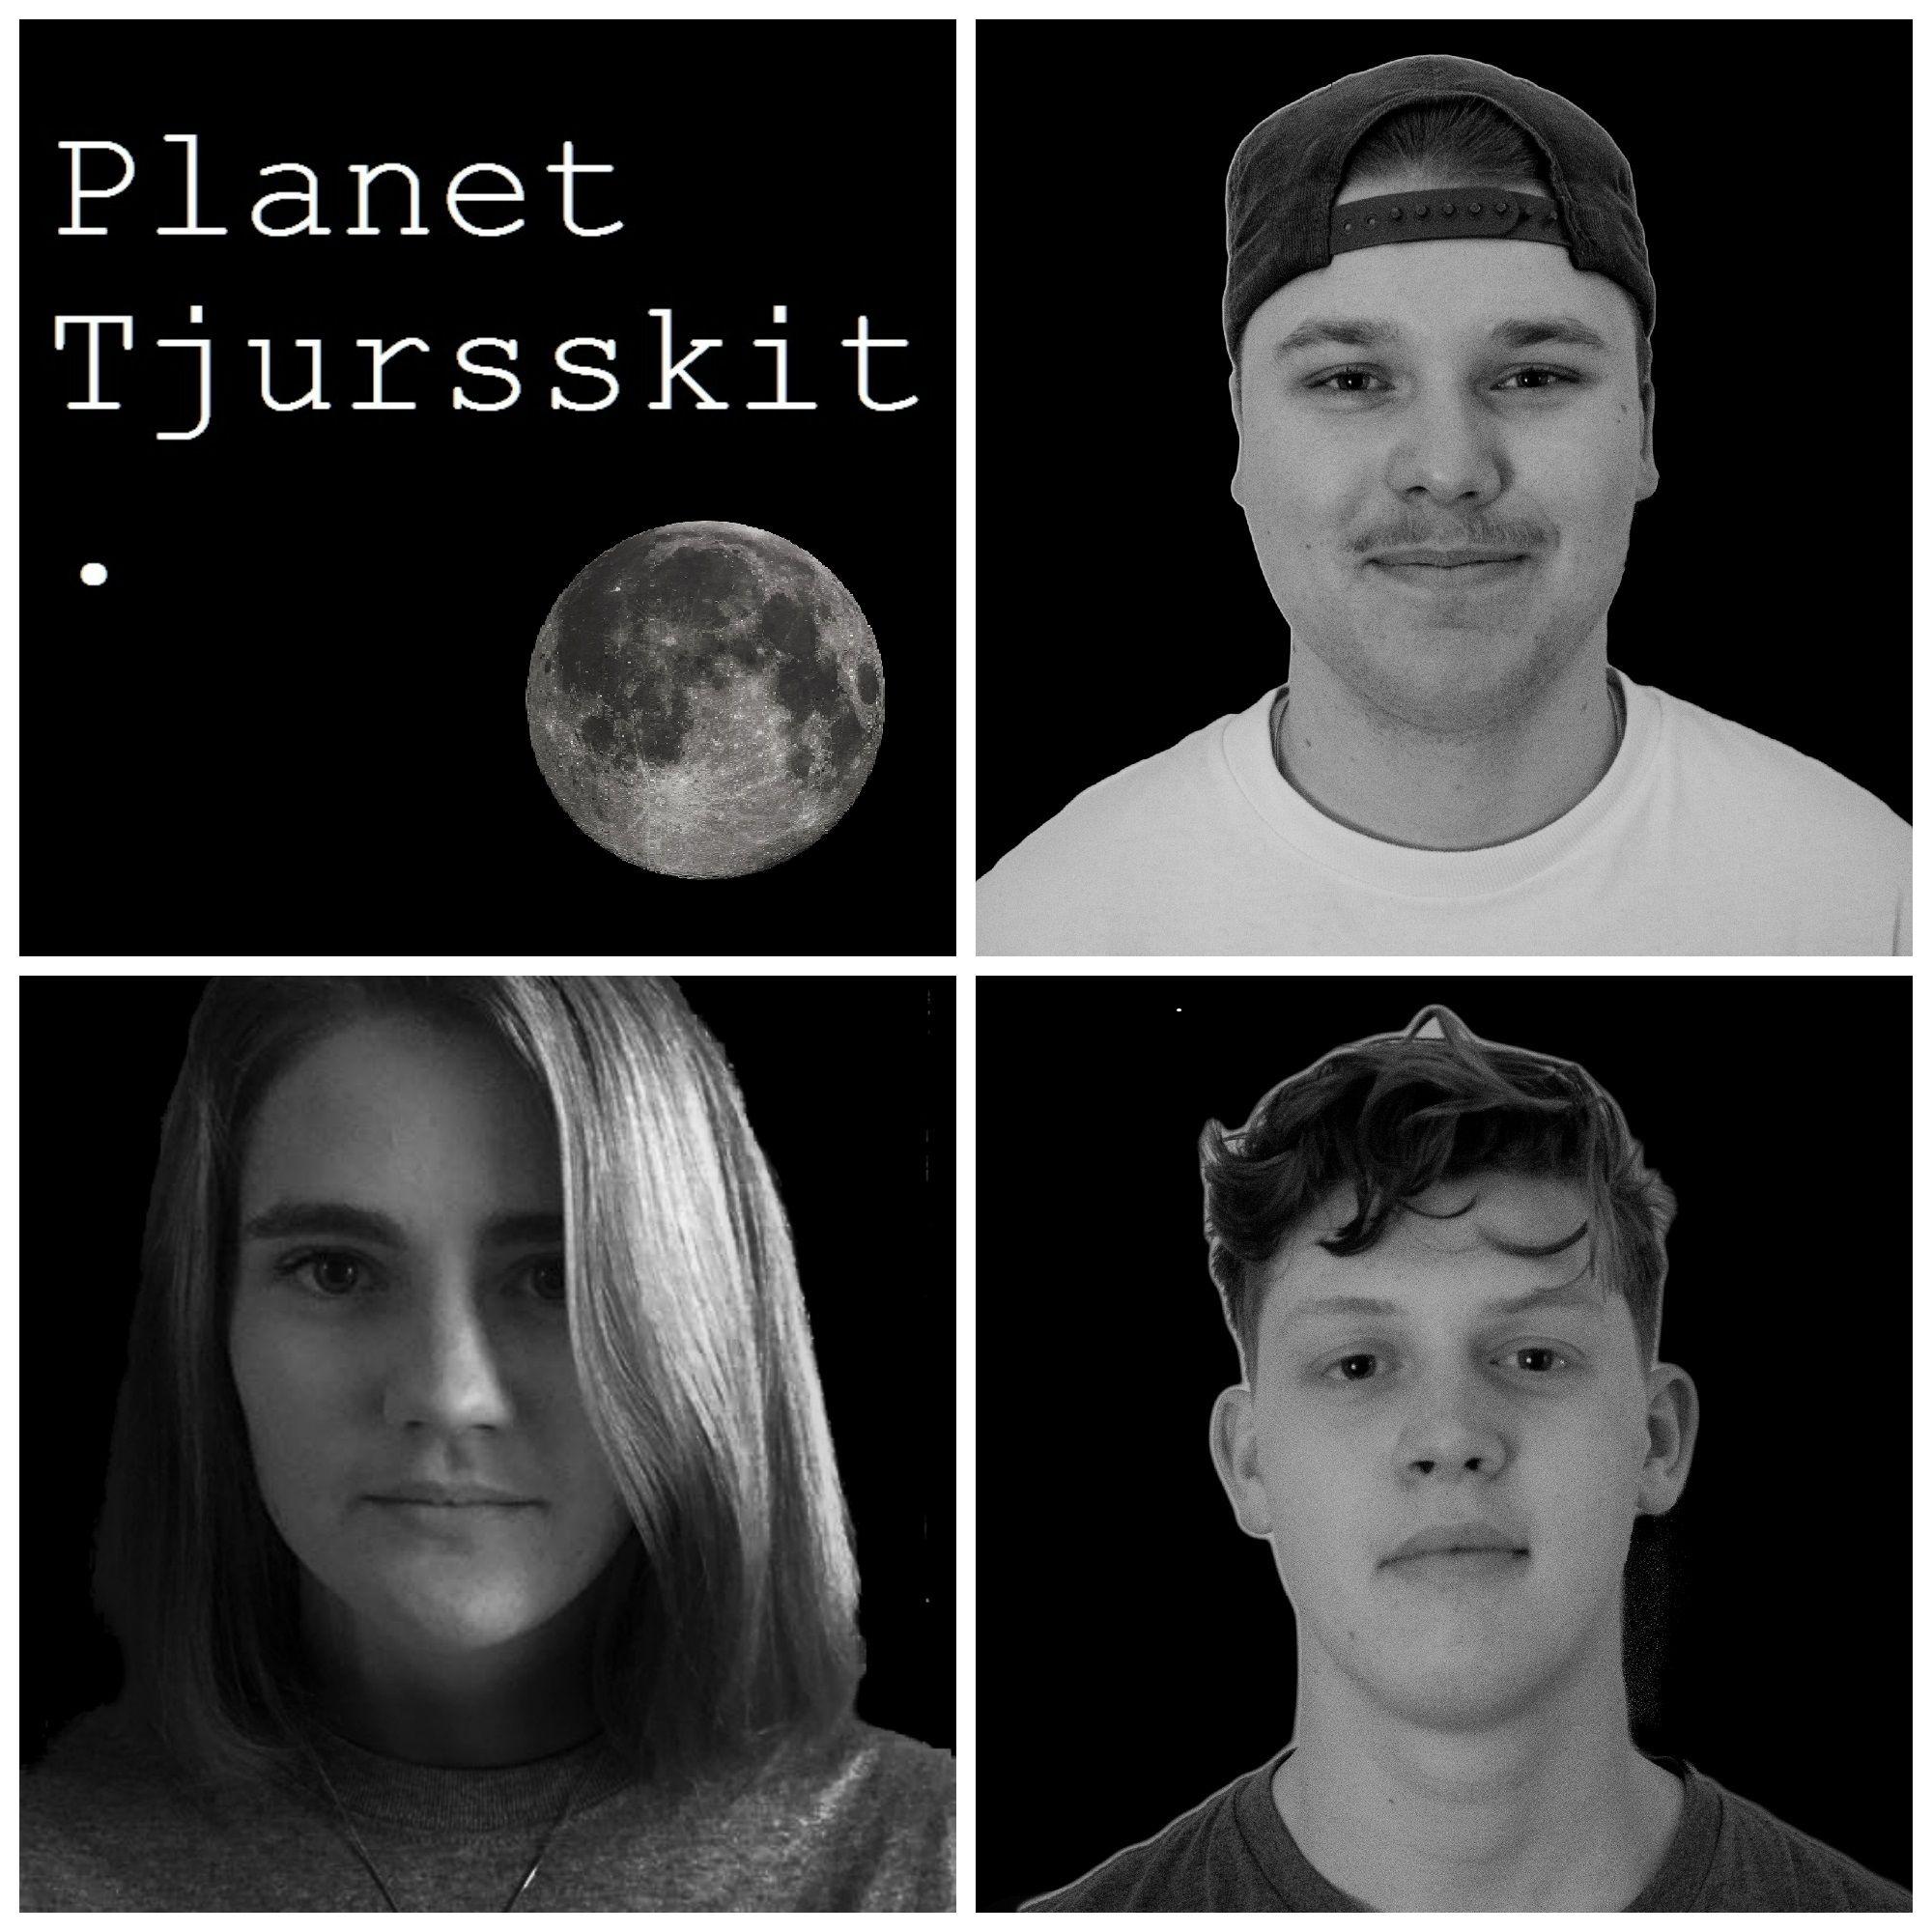 Planet Tjurskit